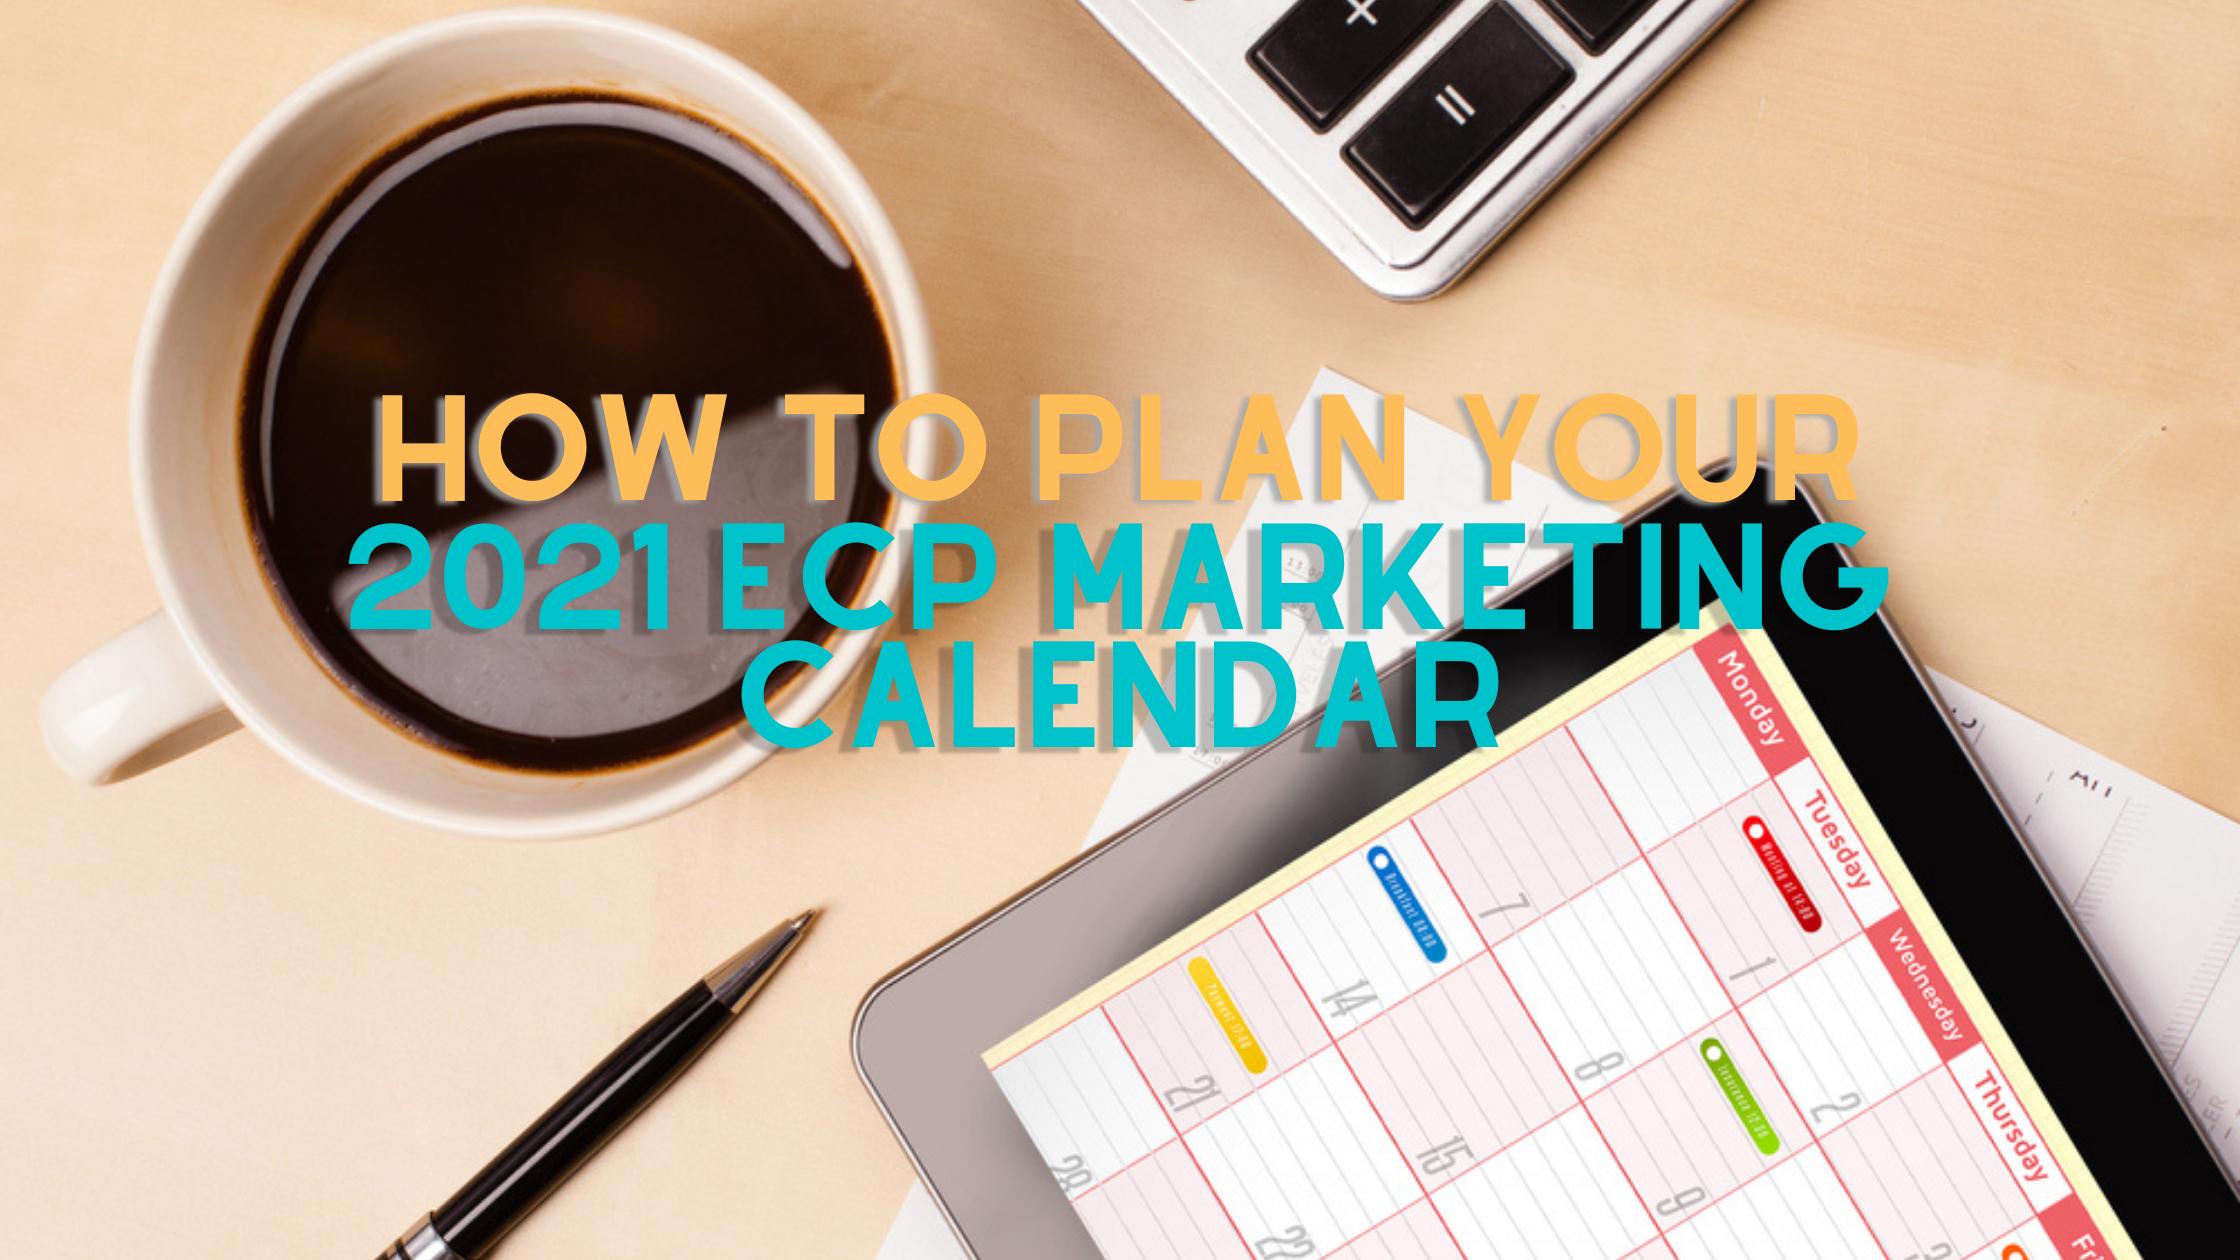 How to plan your 2021 ECP Marketing Calendar